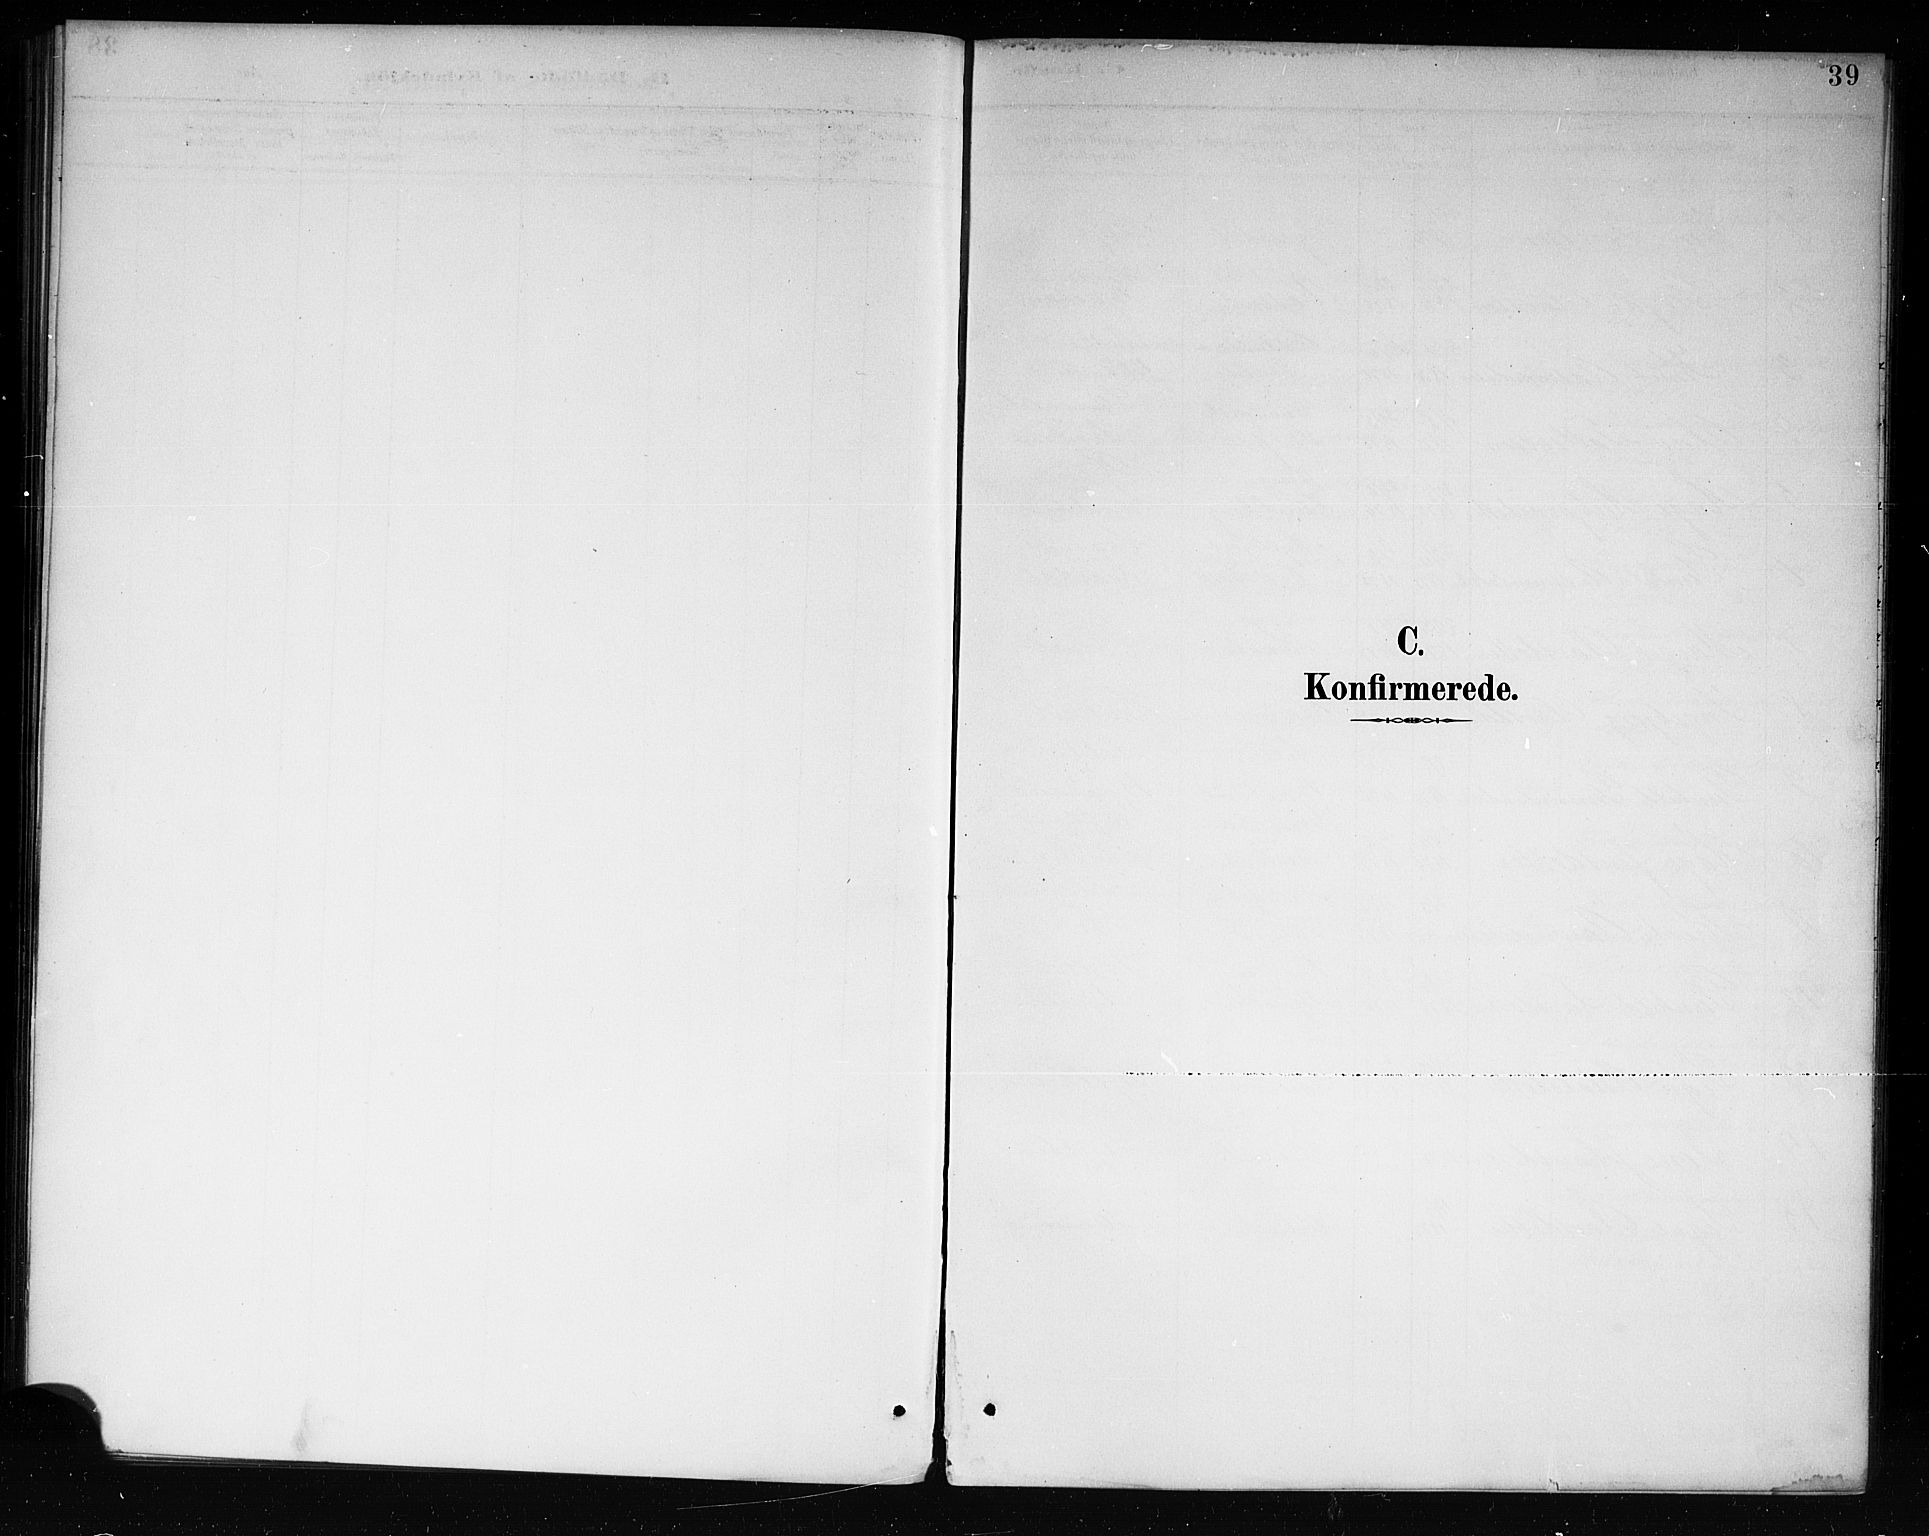 SAKO, Lårdal kirkebøker, G/Ga/L0003: Klokkerbok nr. I 3, 1891-1918, s. 39